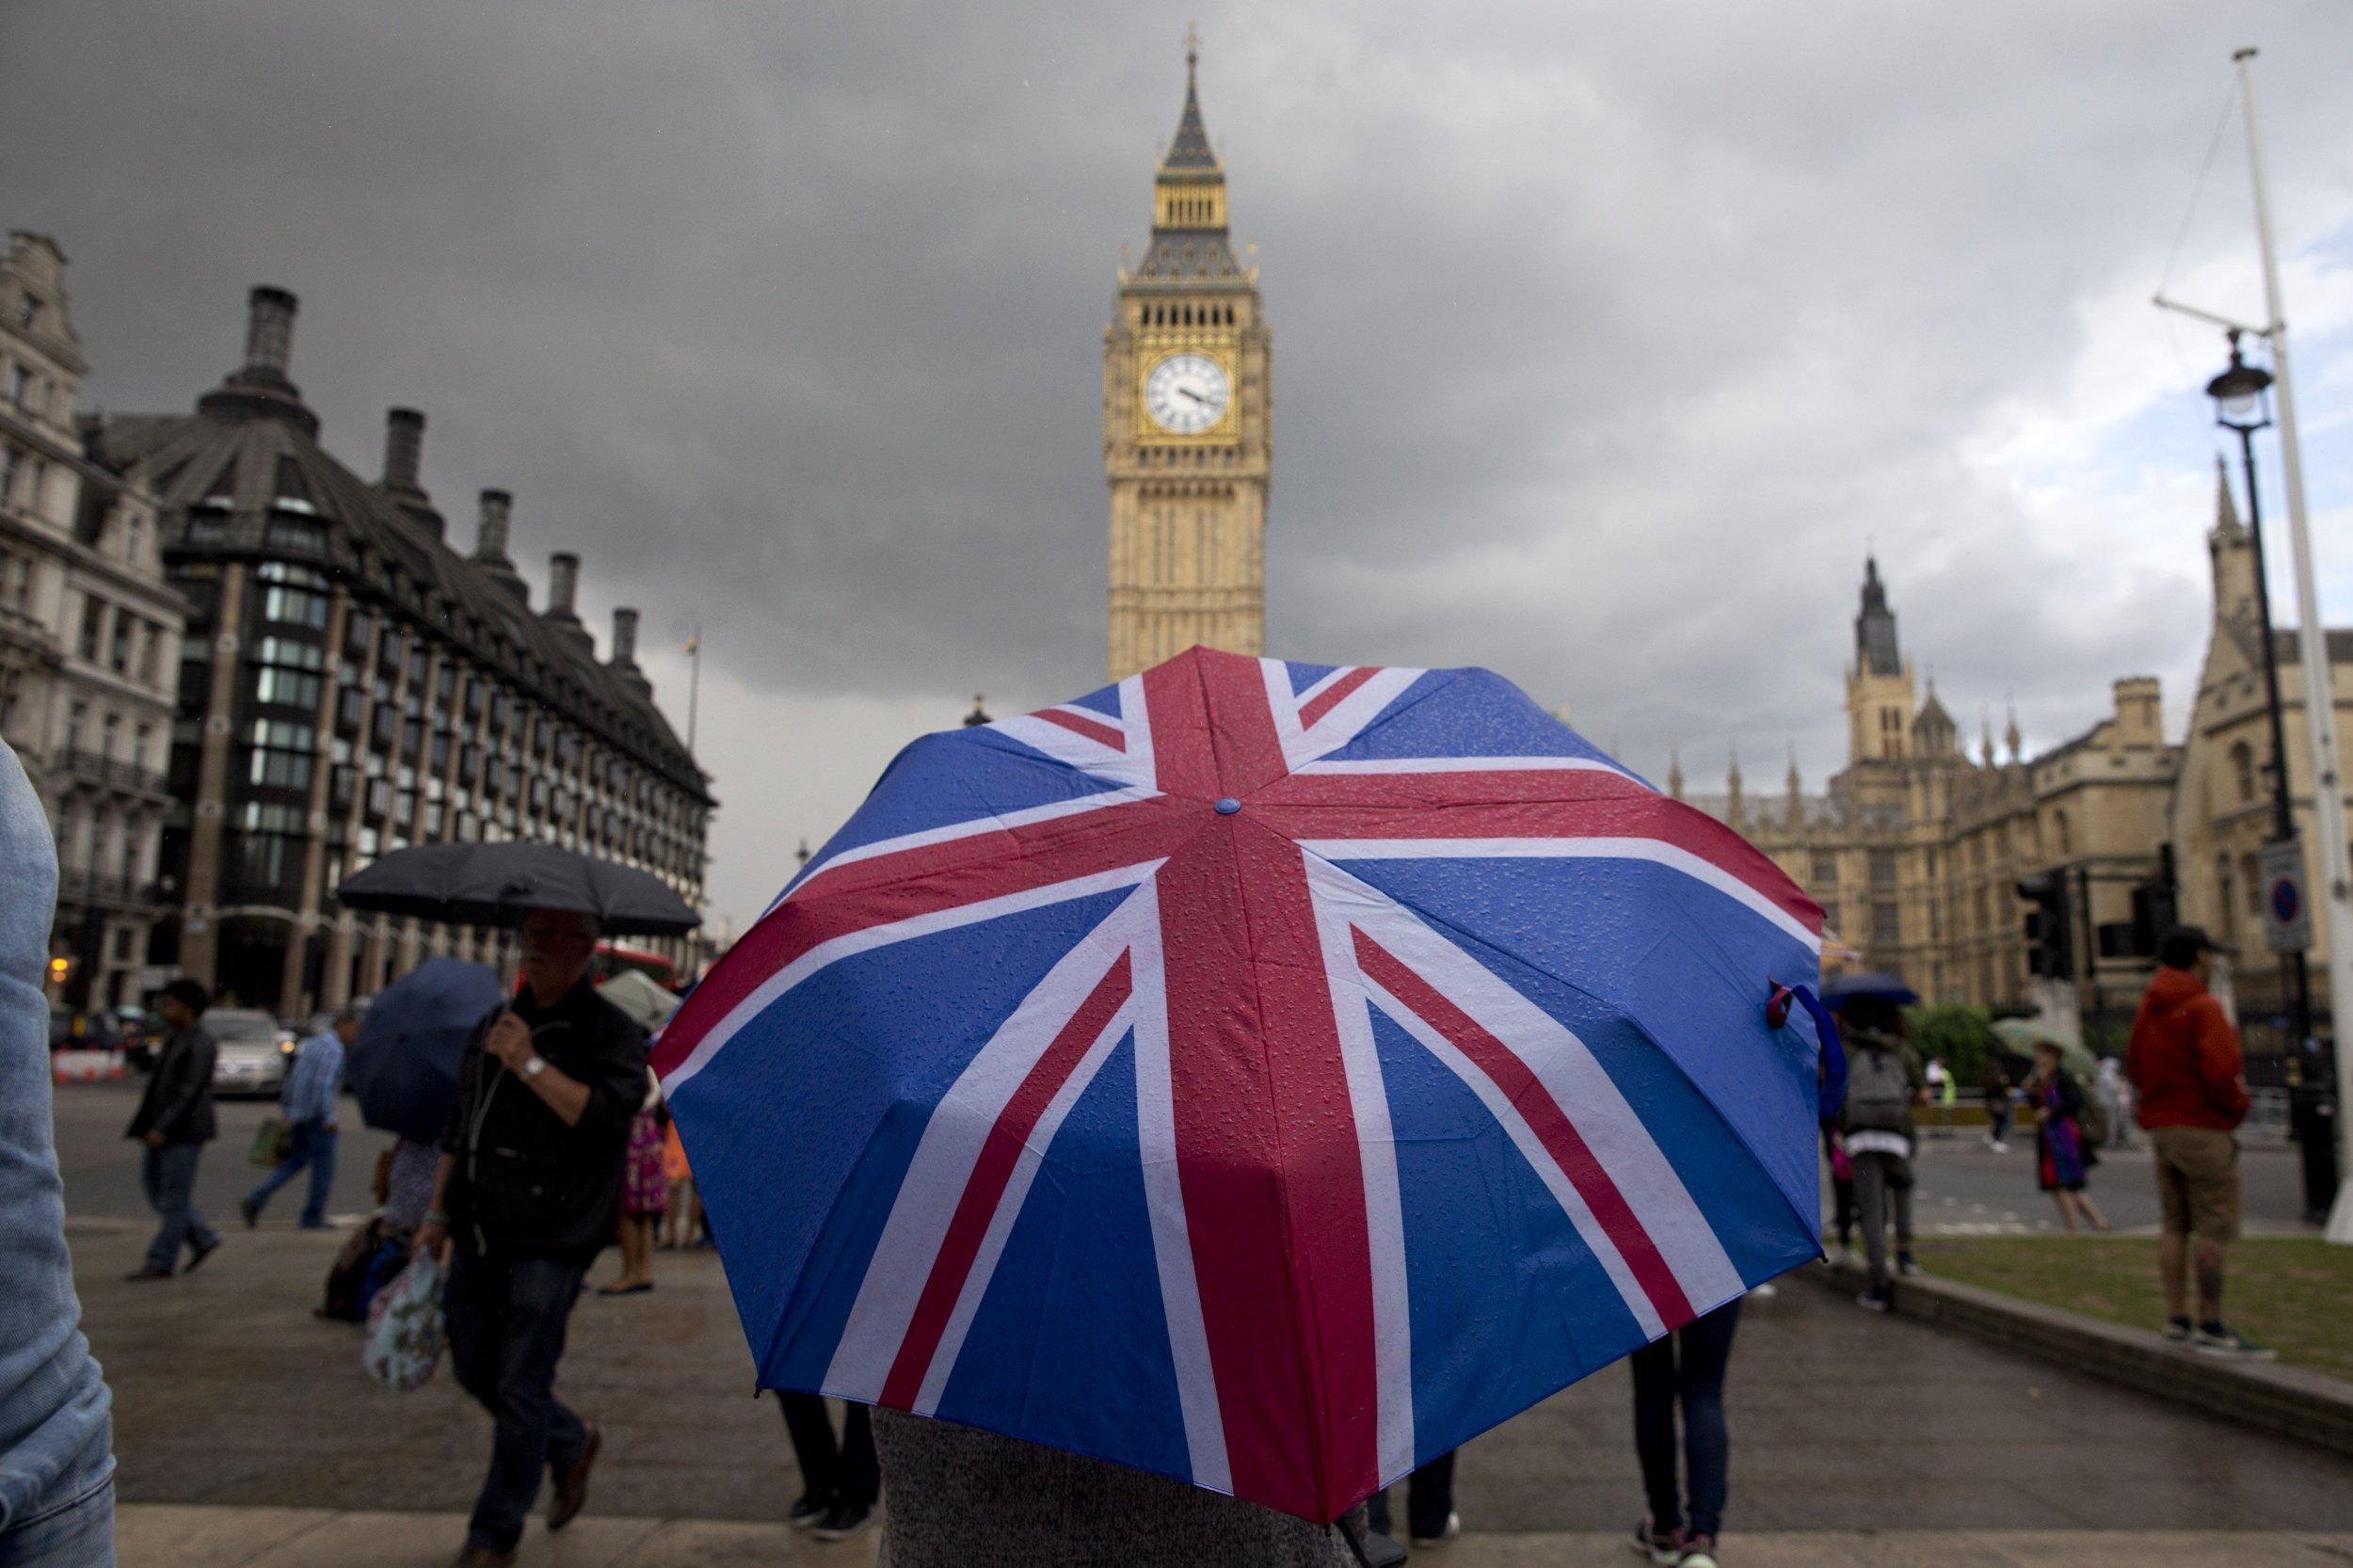 Pedestrian under Union Jack umbrella